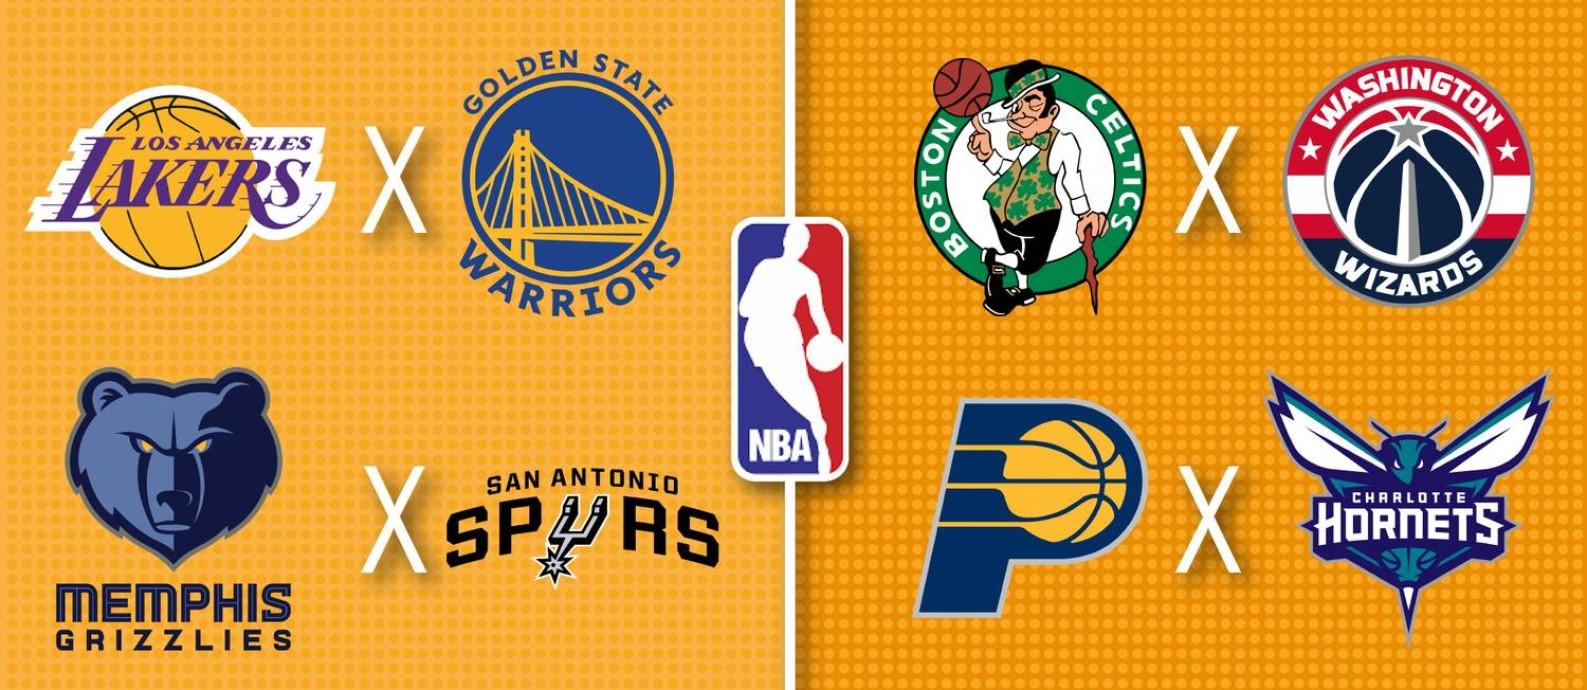 Play-in da NBA começa nesta terça-feira Foto: Editoria de Arte